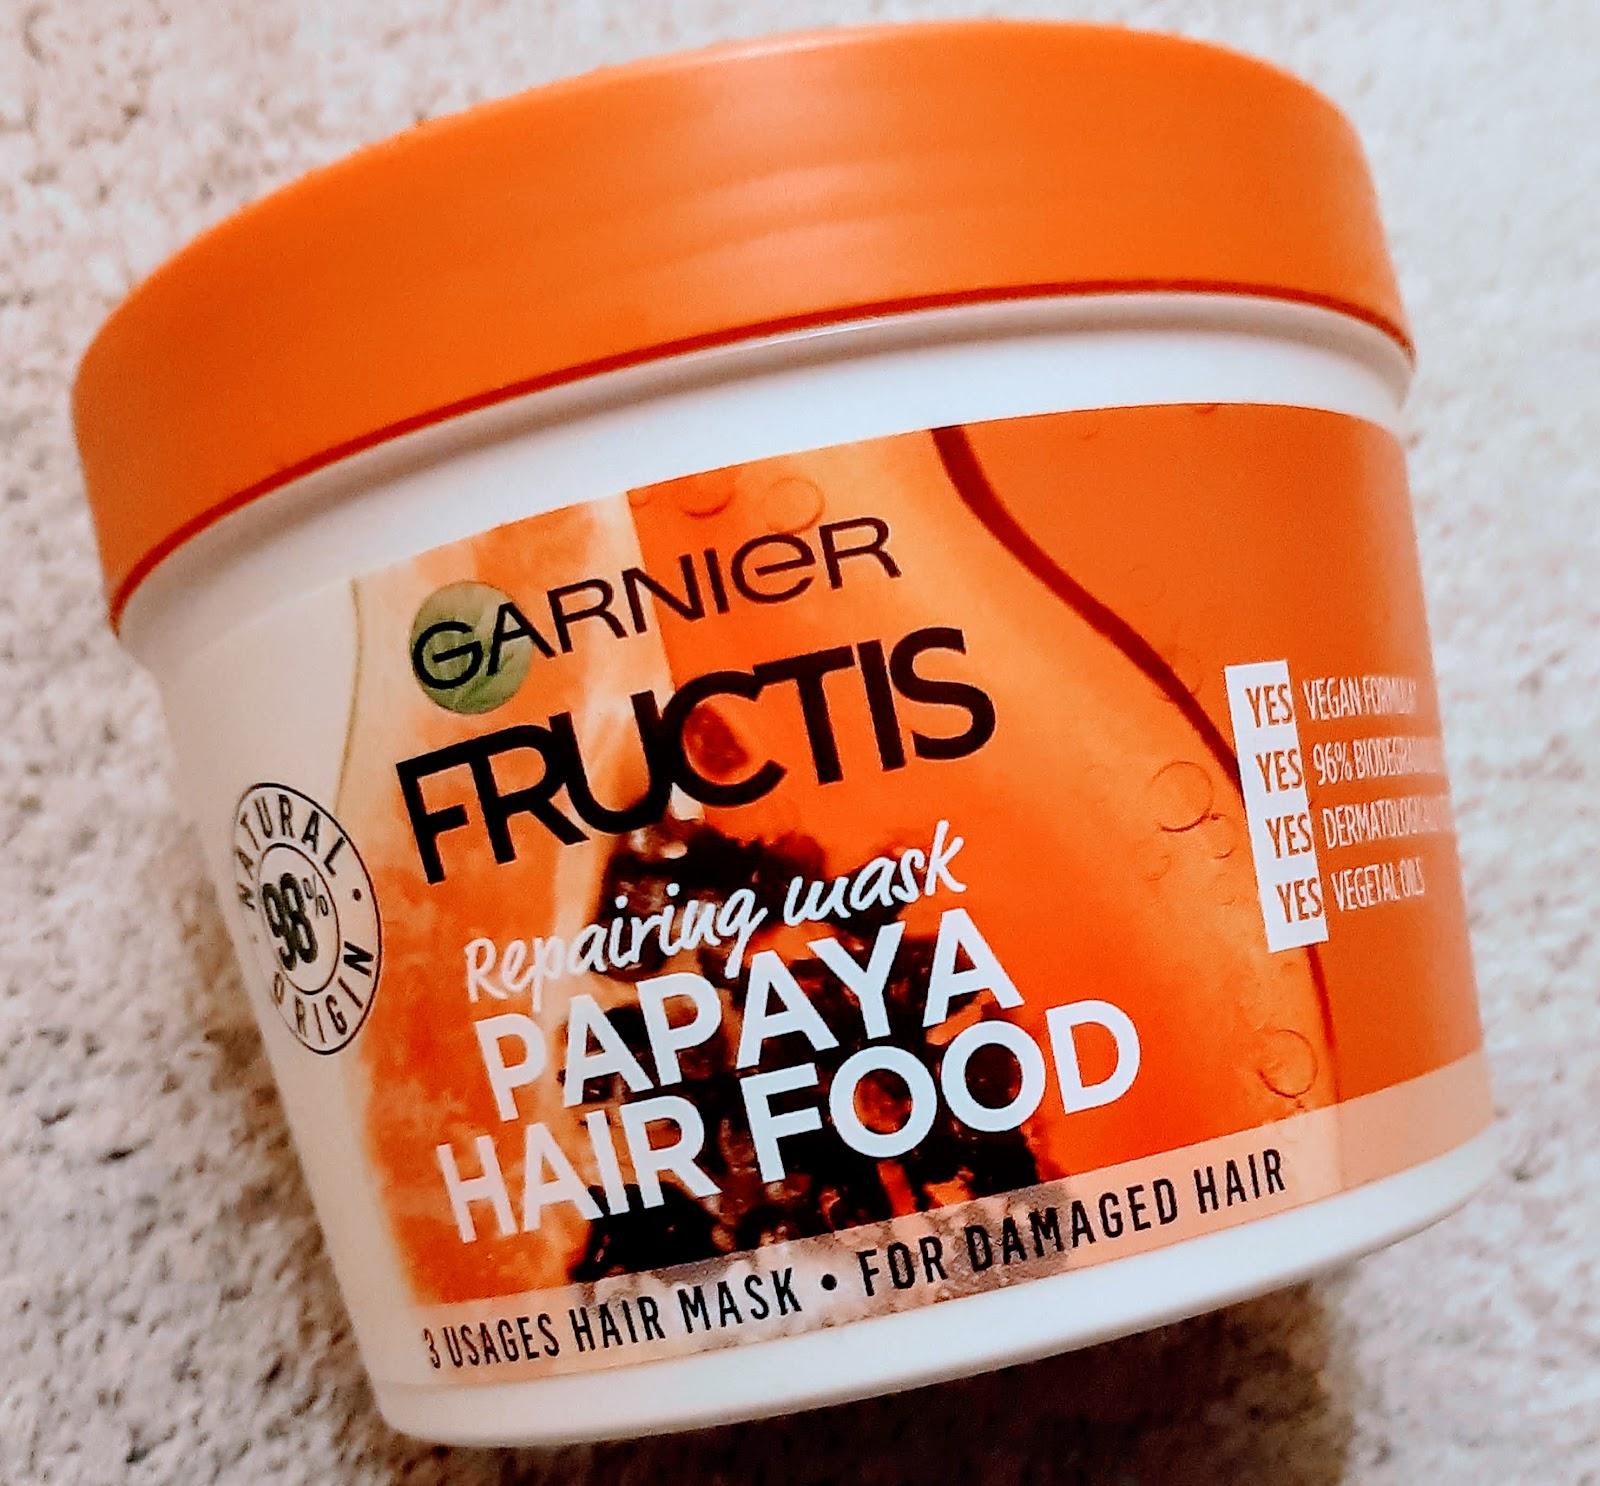 MonalisaBeautyEriAnna  Garnier Fructis Papaya Hair Food 1a6a212bab1